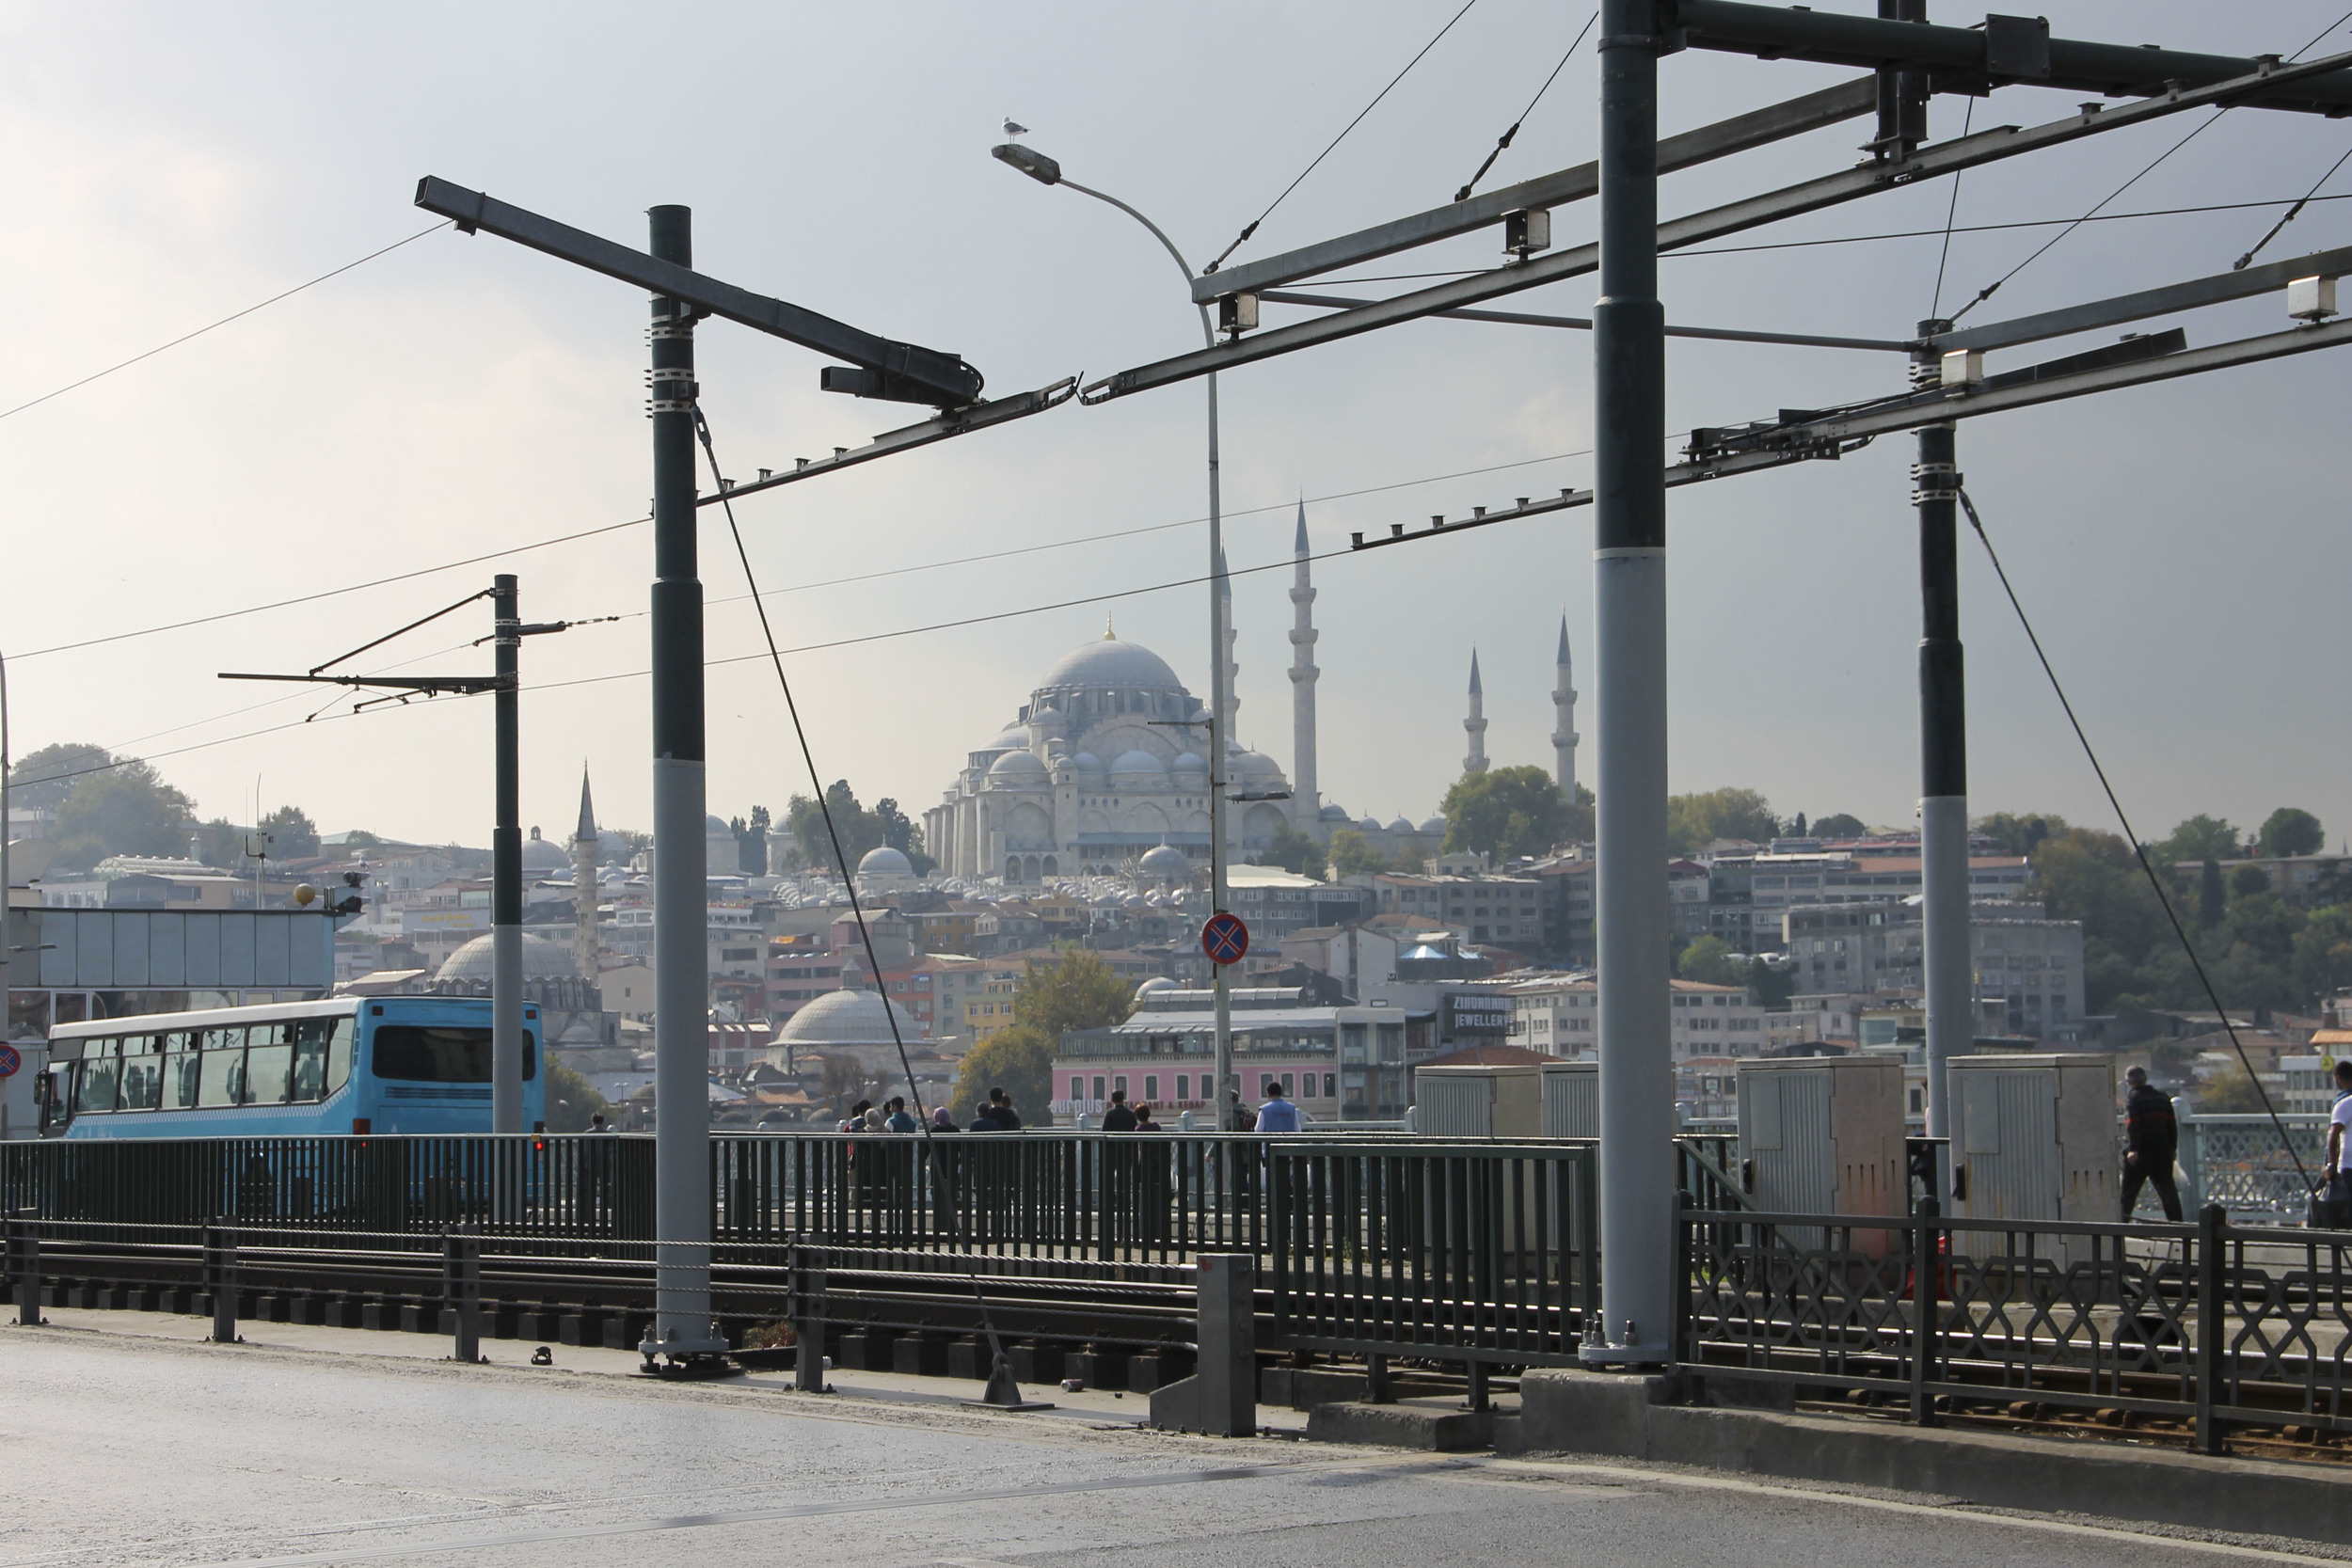 Istanbul, ygatonic on tour, Turkey yoga in istanbul2213.jpg